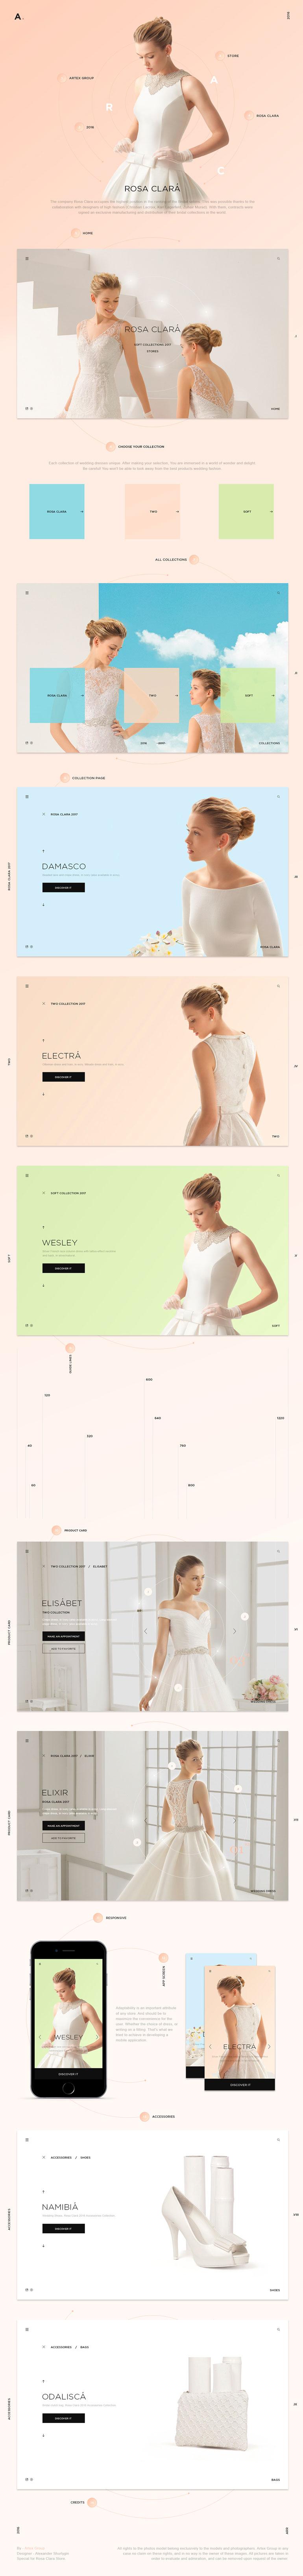 Creative_Website_Design_Inspiration_2016_011